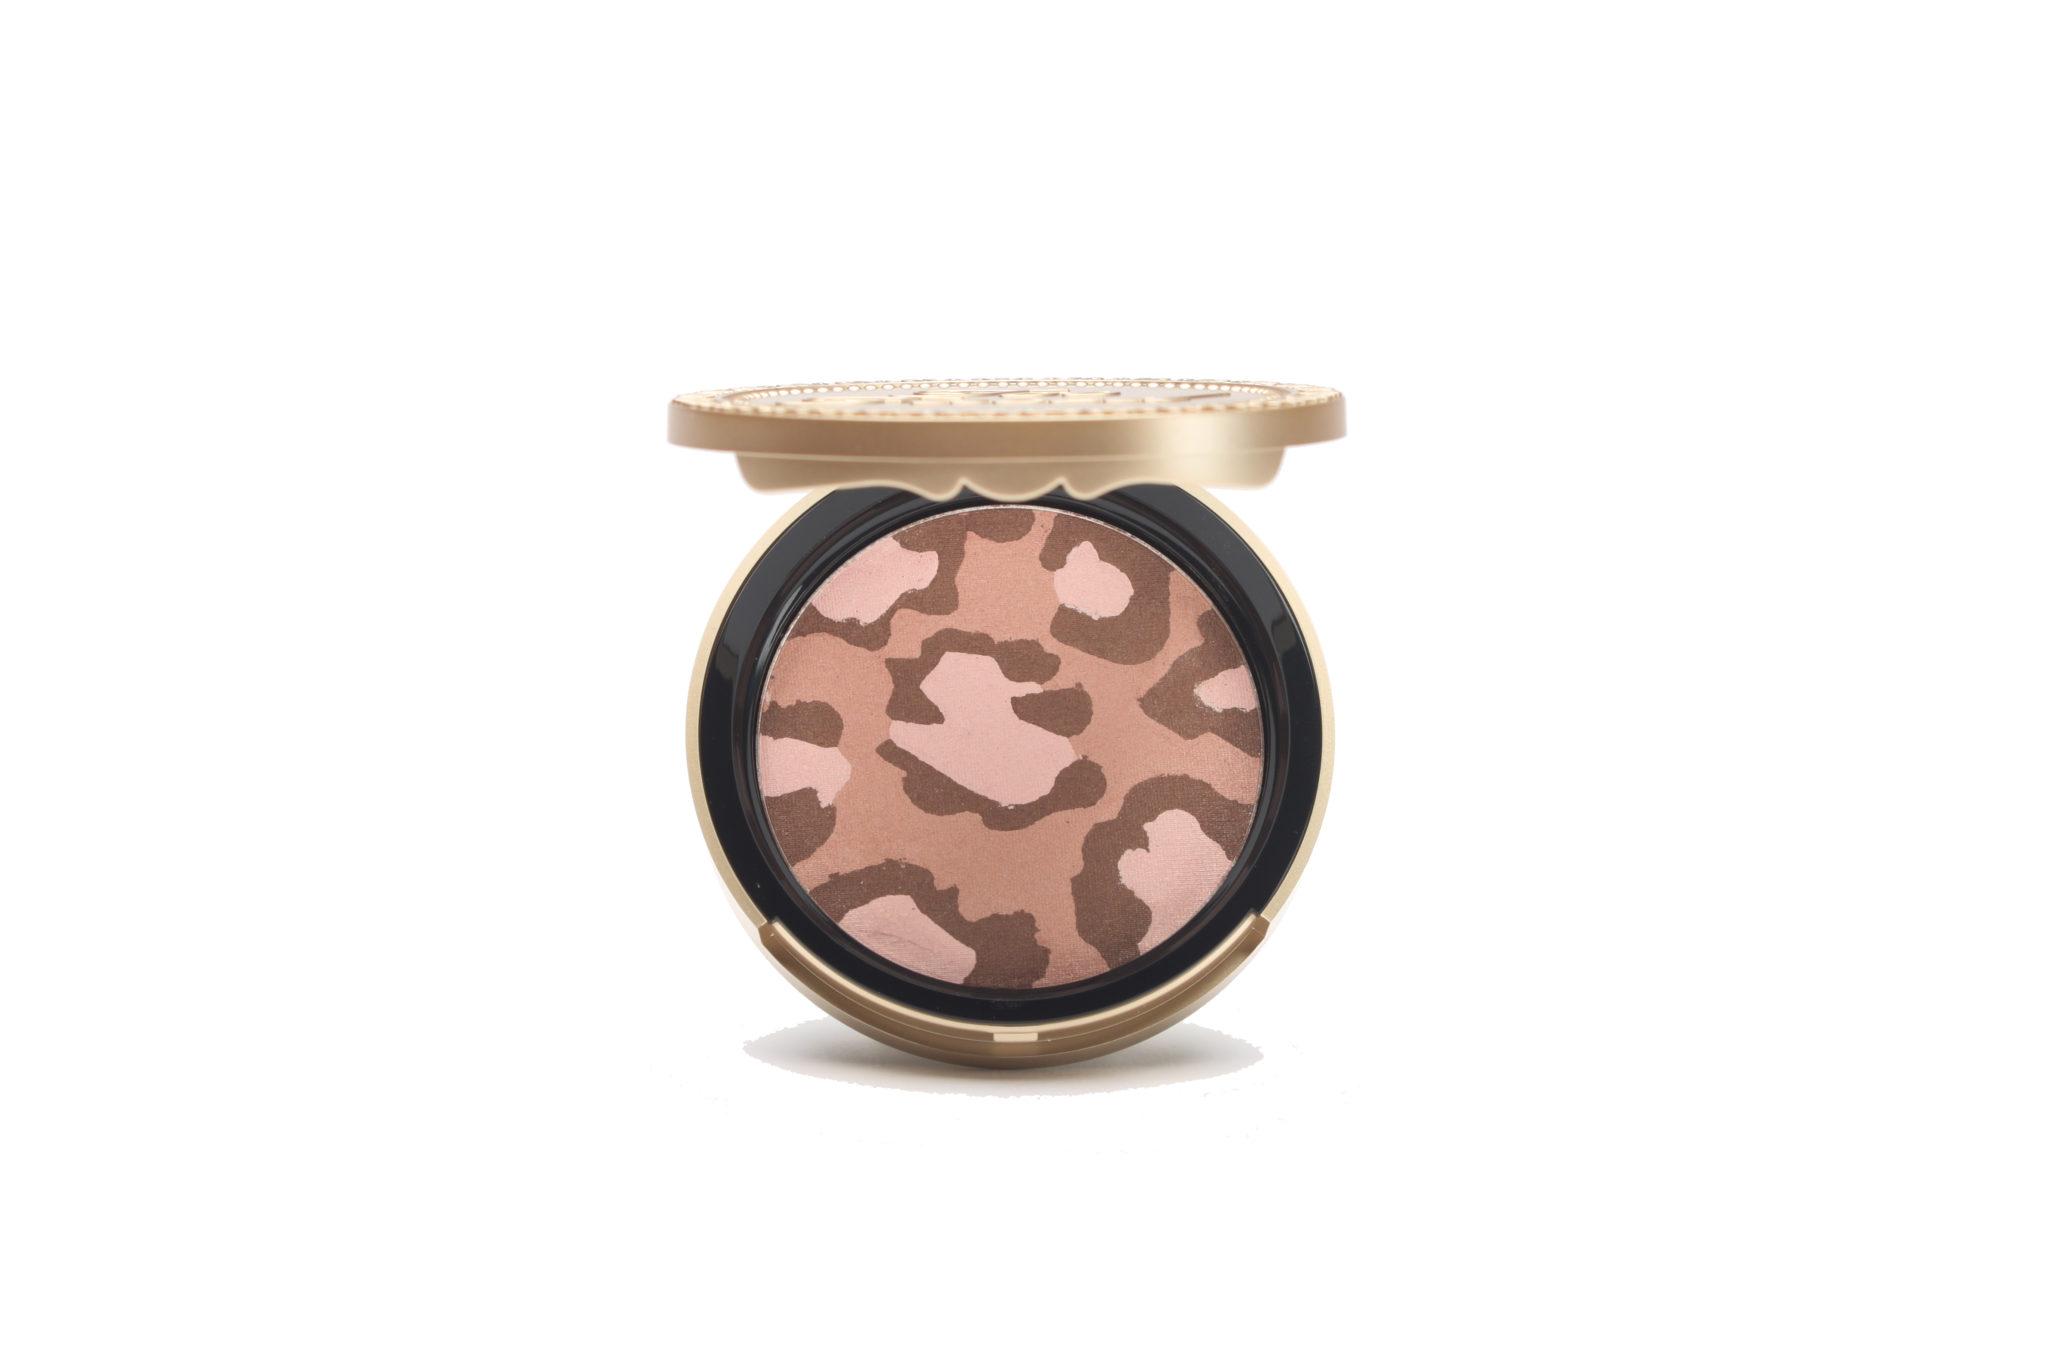 54212 Pink leopard Blushing Powder 0.26 oz Product